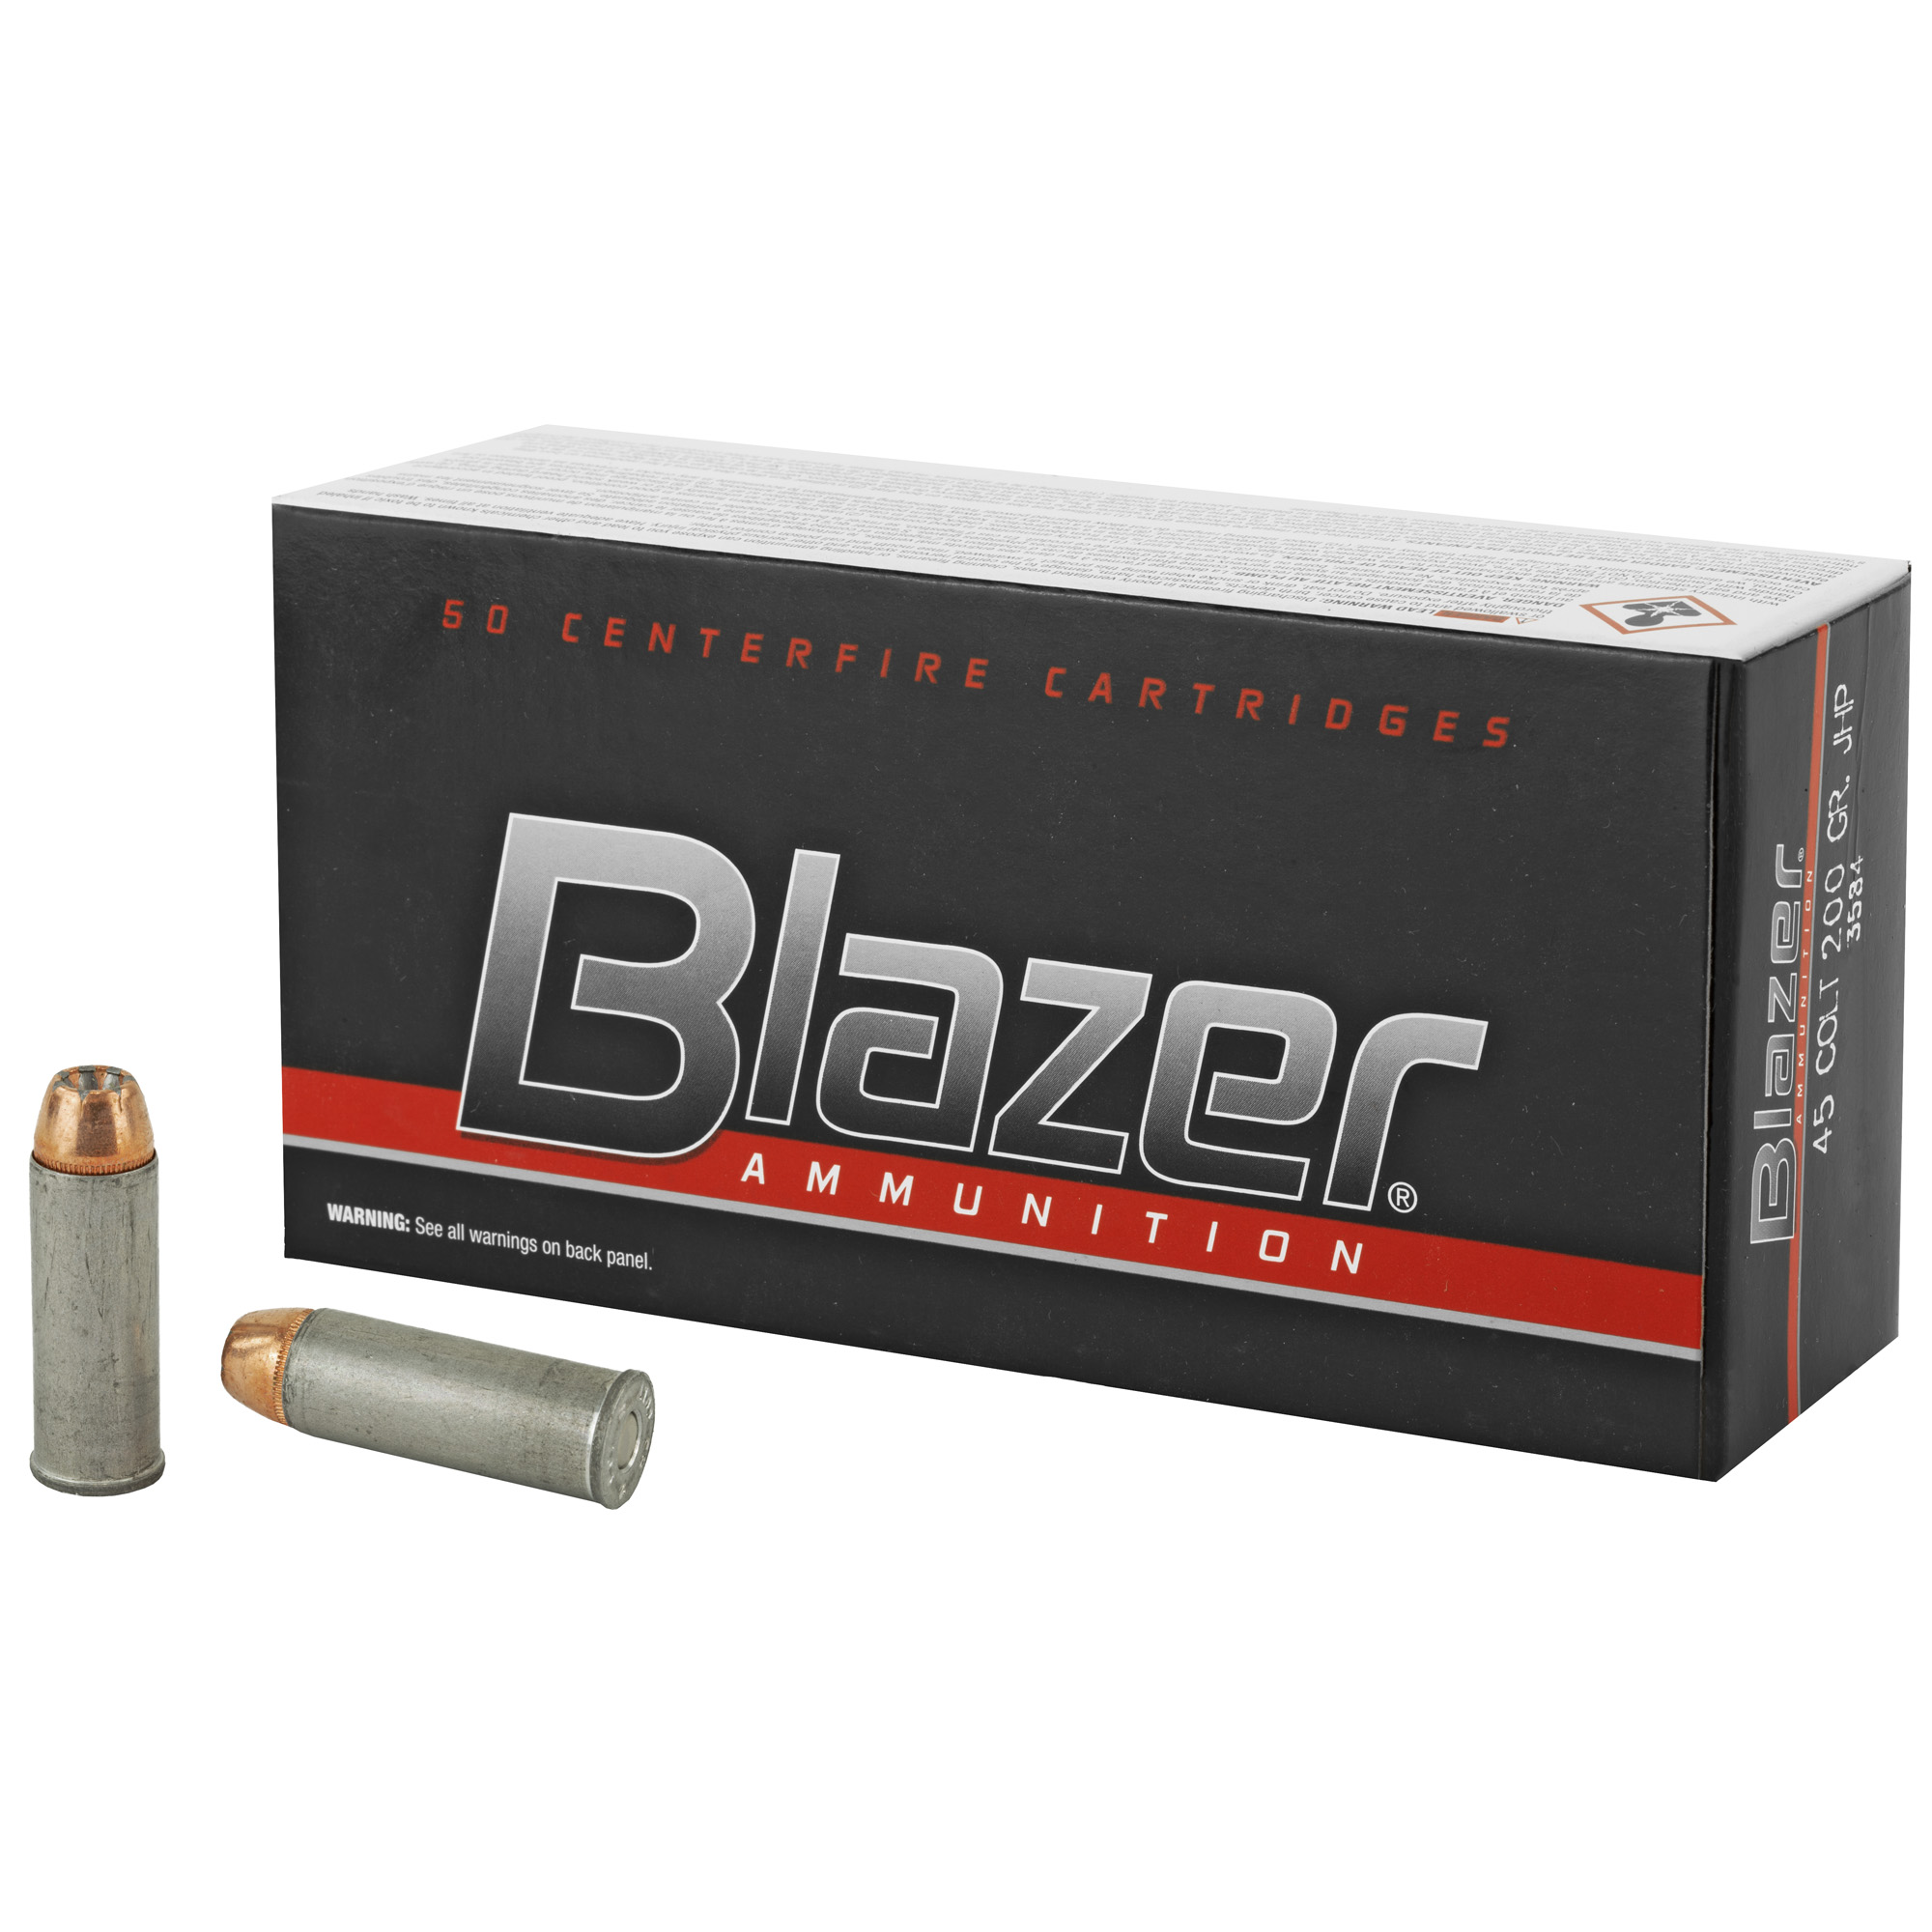 Cci/blazer 45 Colt 200gr Jhp 50/1000